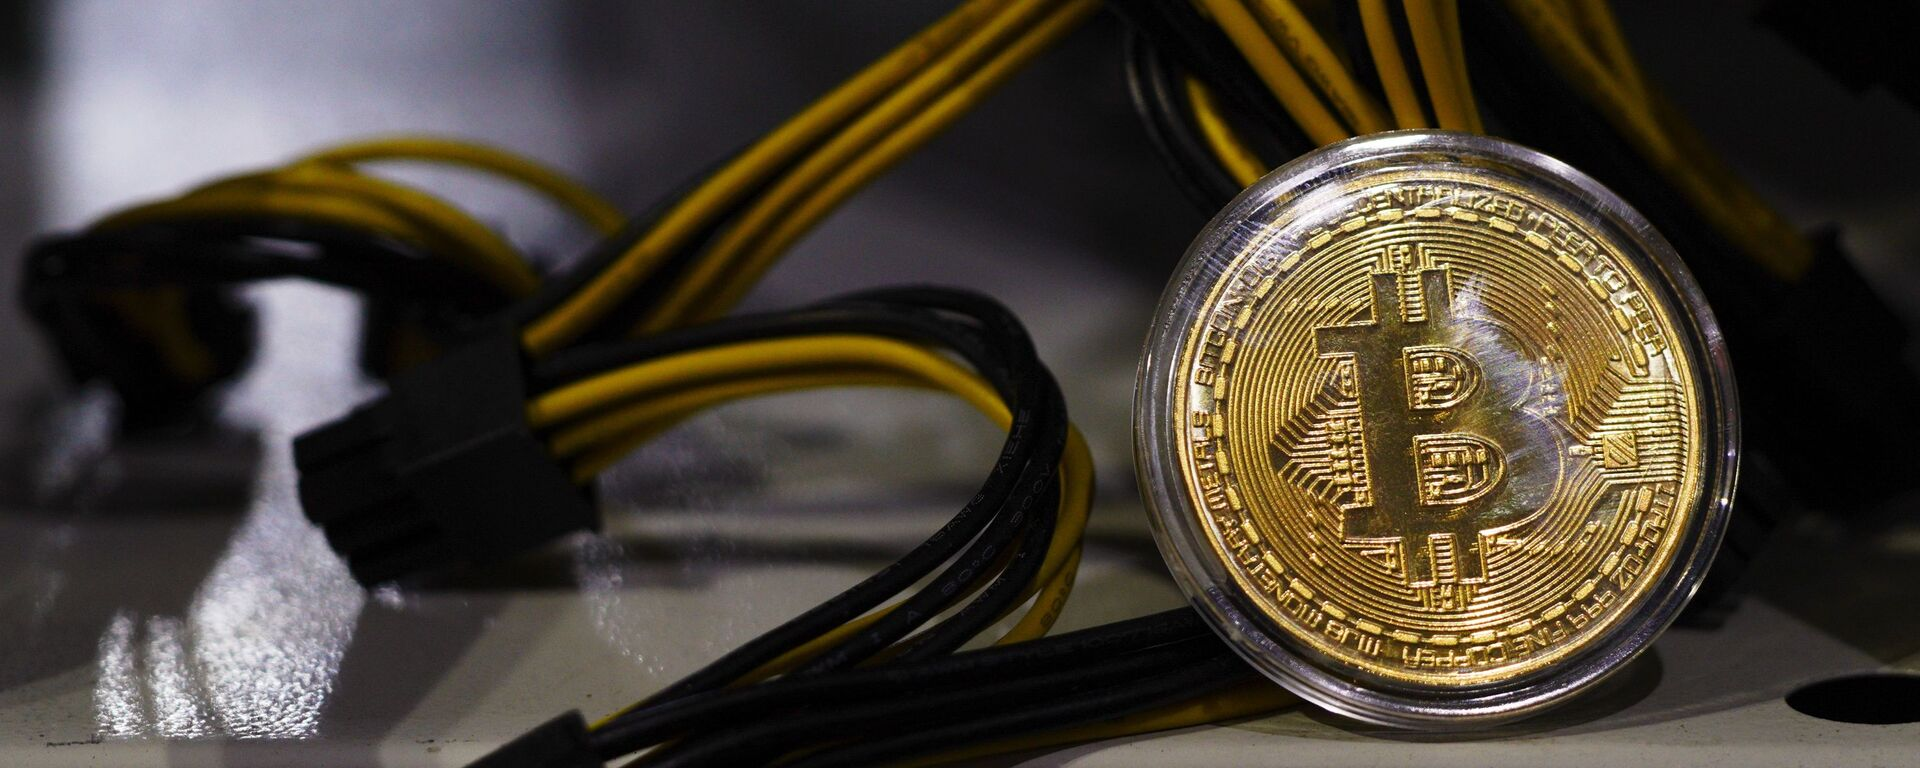 Moneta Bitcoin - Sputnik Italia, 1920, 09.02.2021